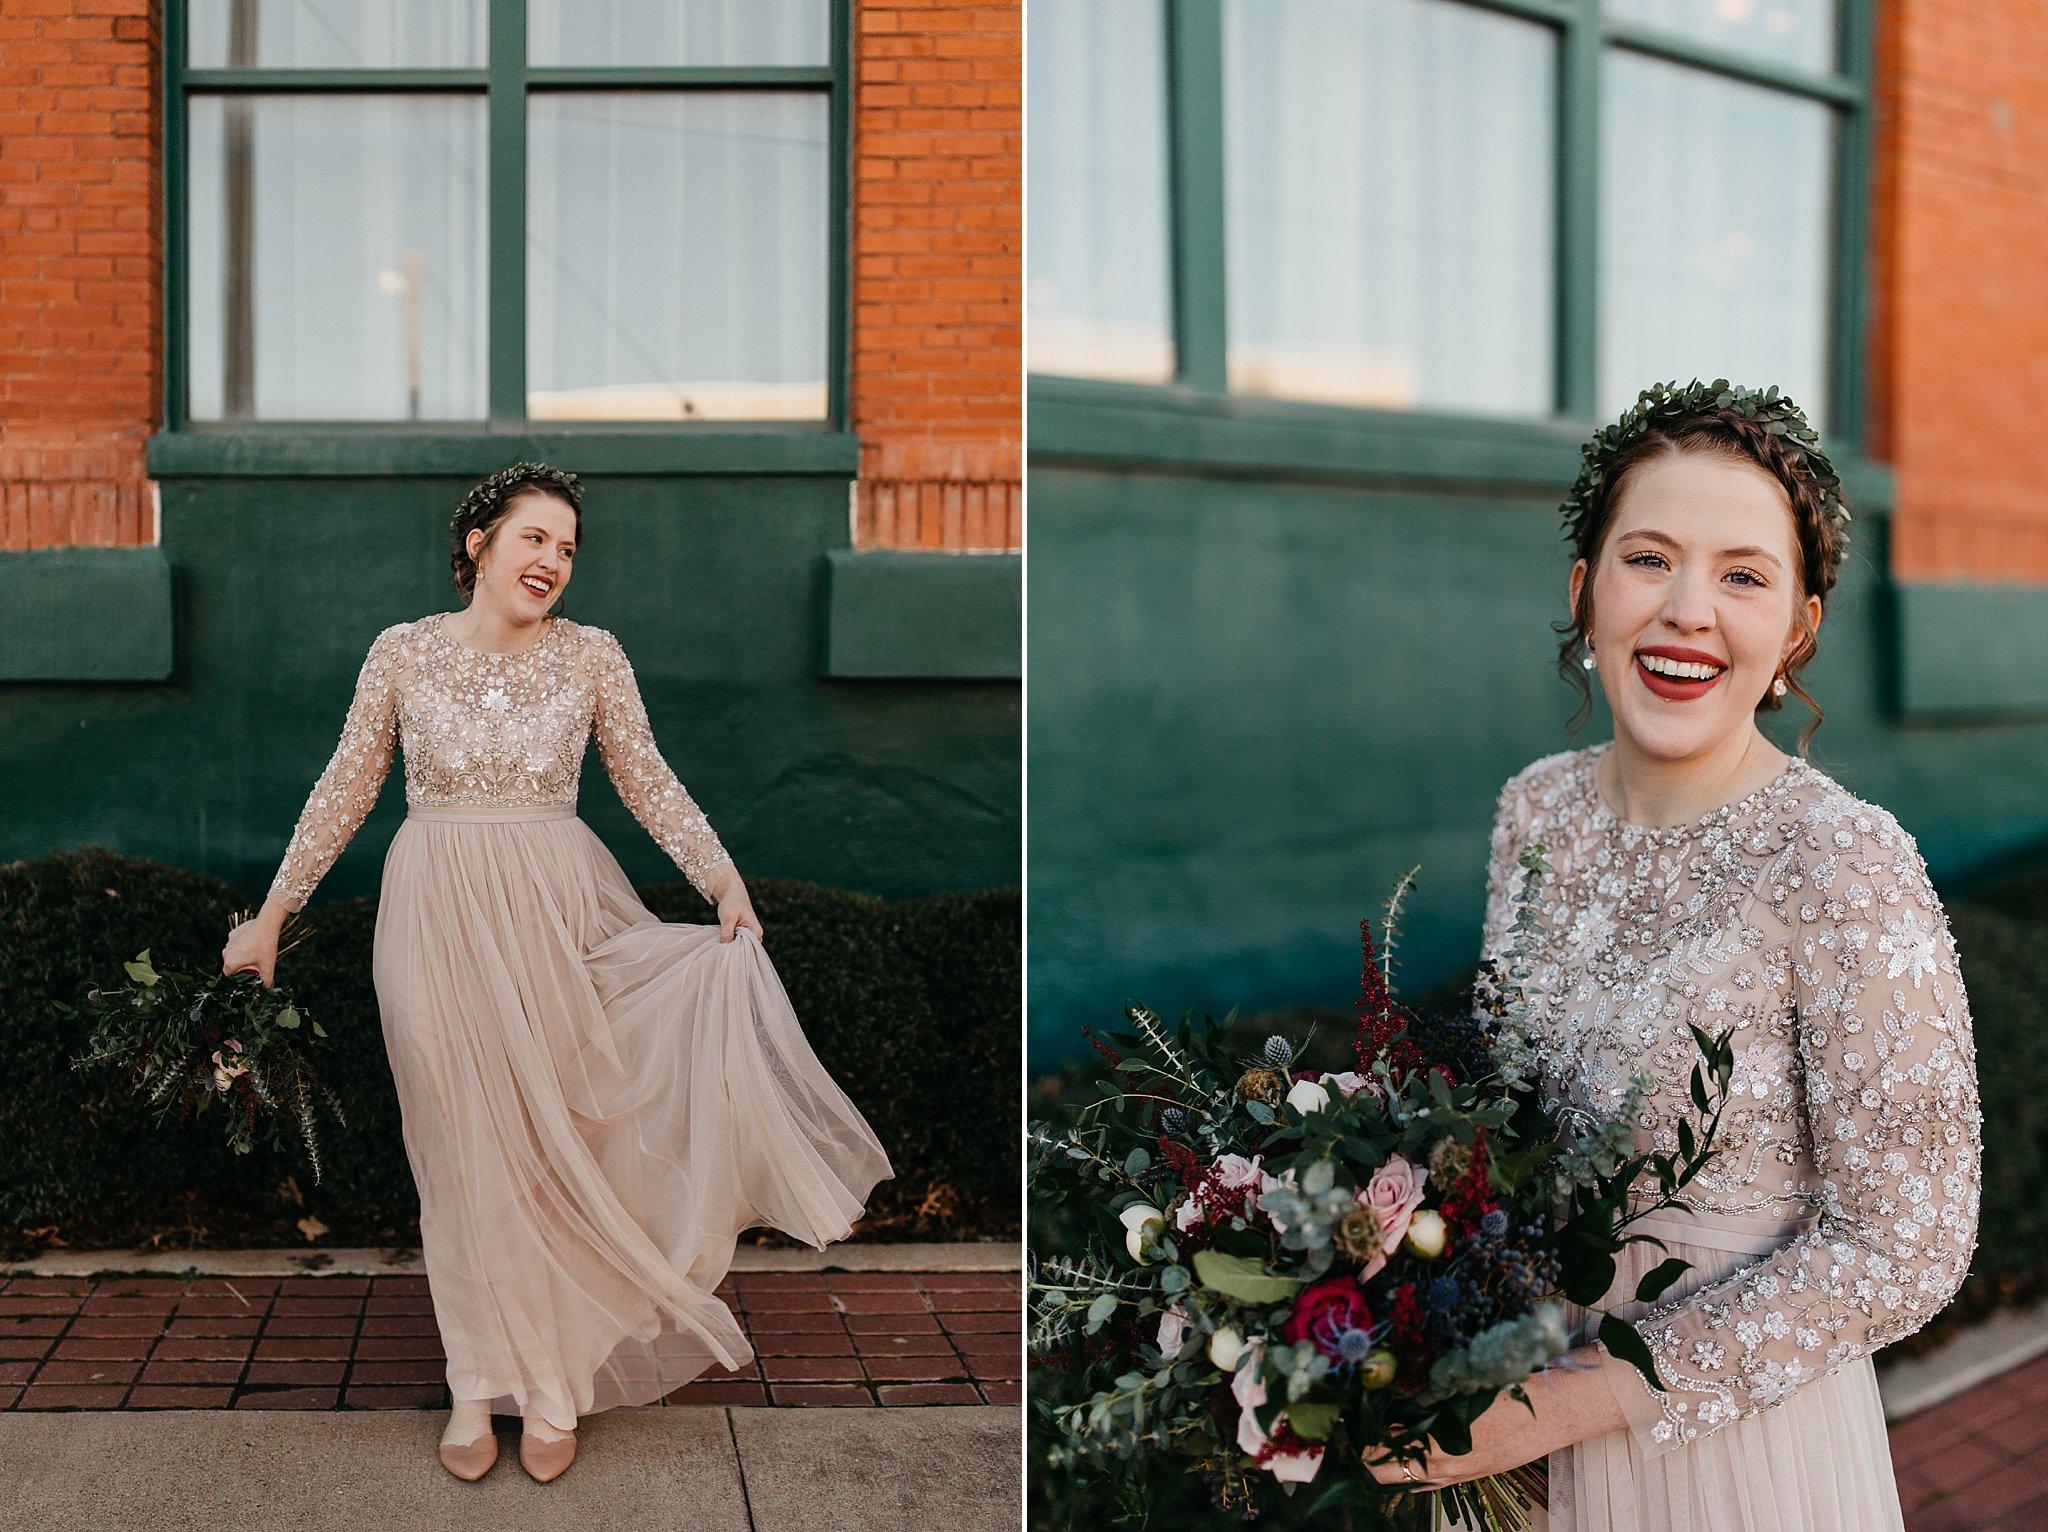 Wilderlove Co_Waco Texas_The Phoenix_Romantic Wedding Photography_0046.jpg